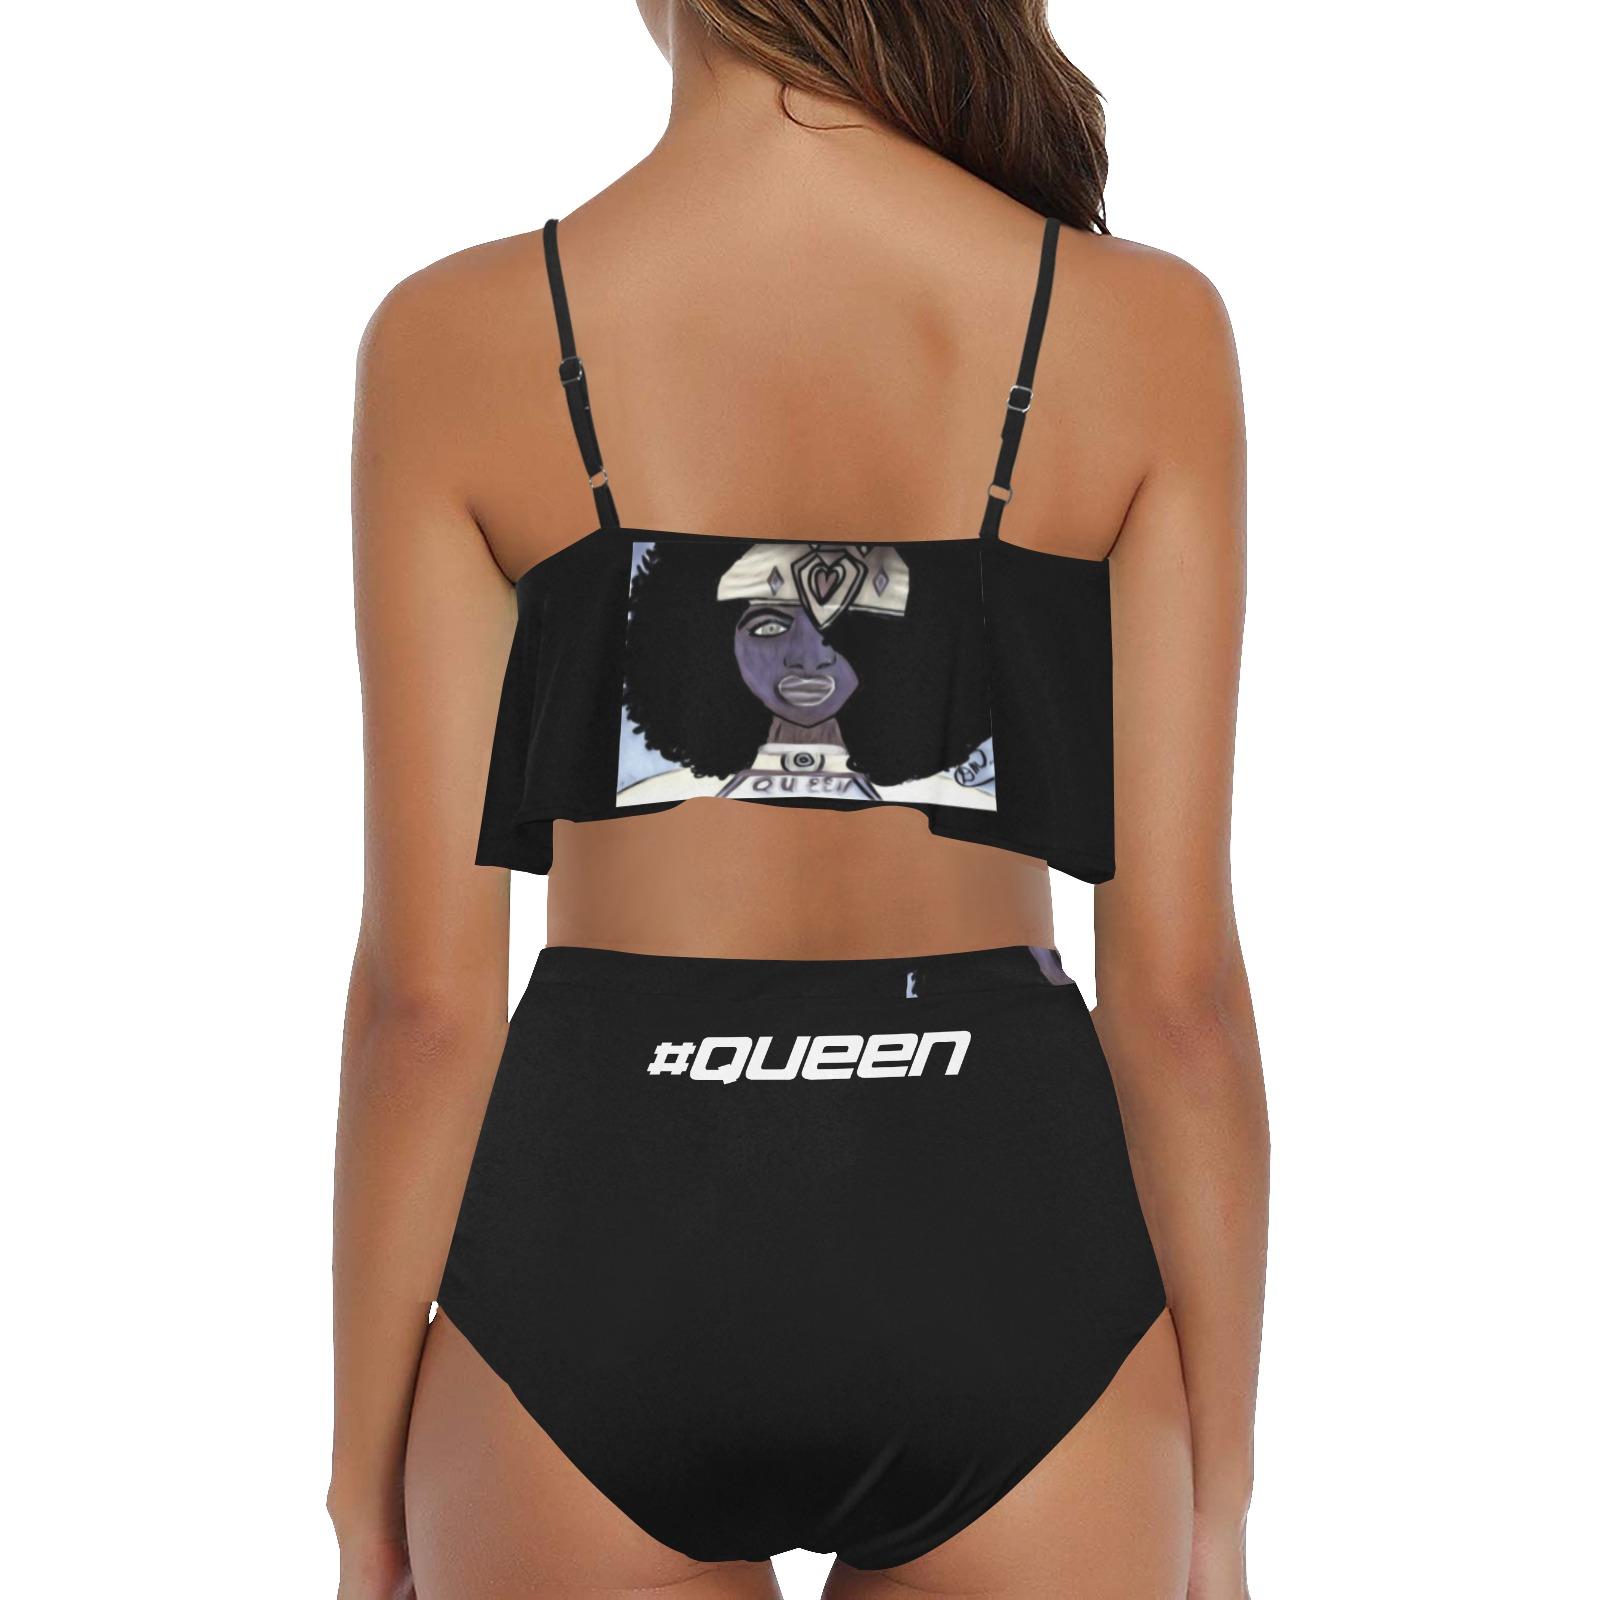 QUEEN SWIMWEAR1 High Waisted Ruffle Bikini Set (Model S13)